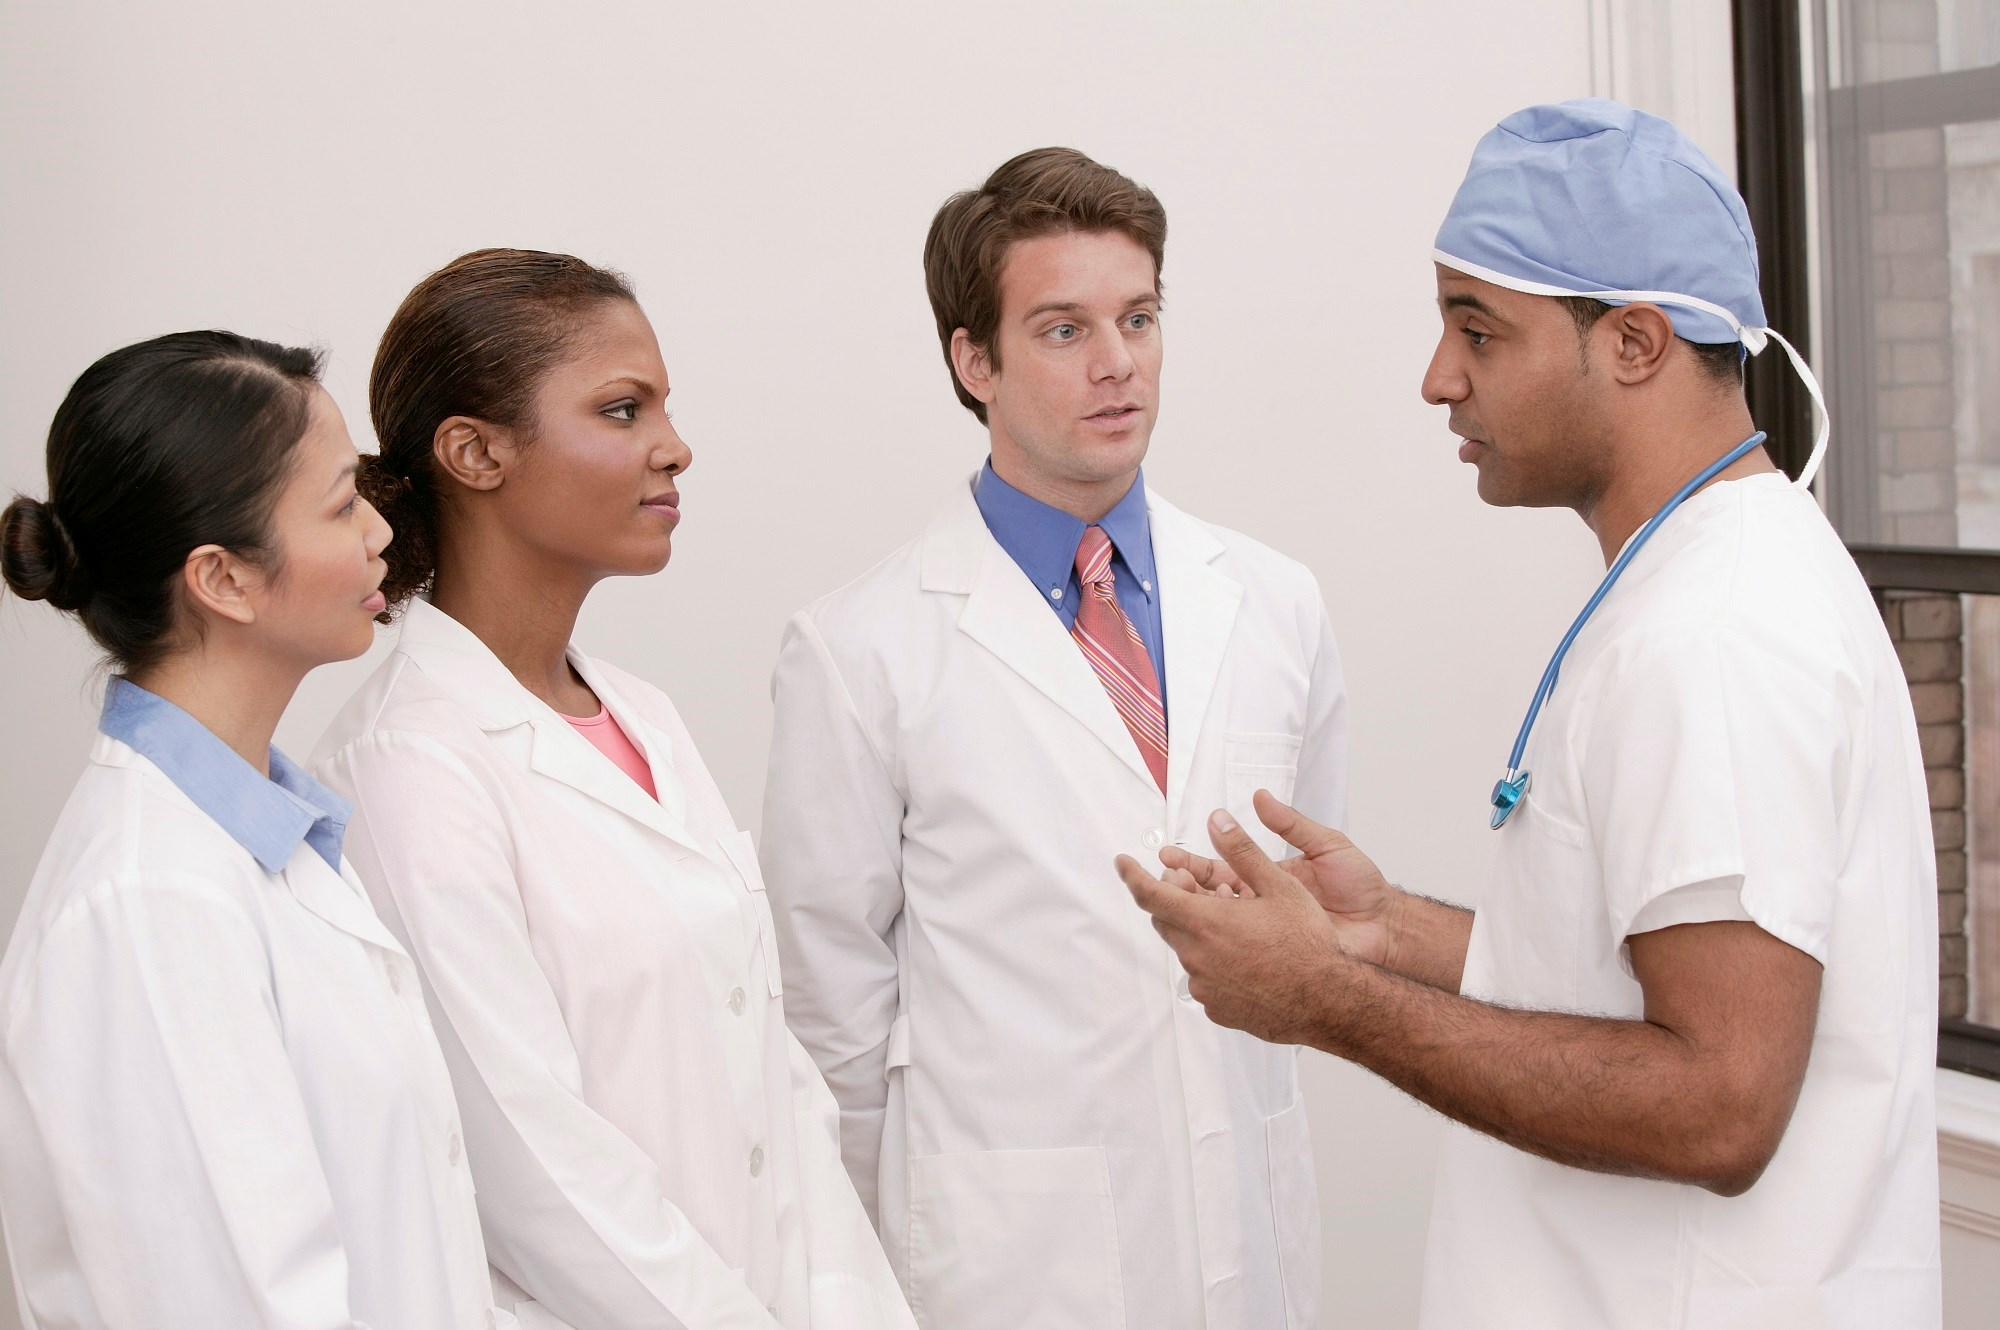 Few Published Programs Address Medical Trainee Mistreatment